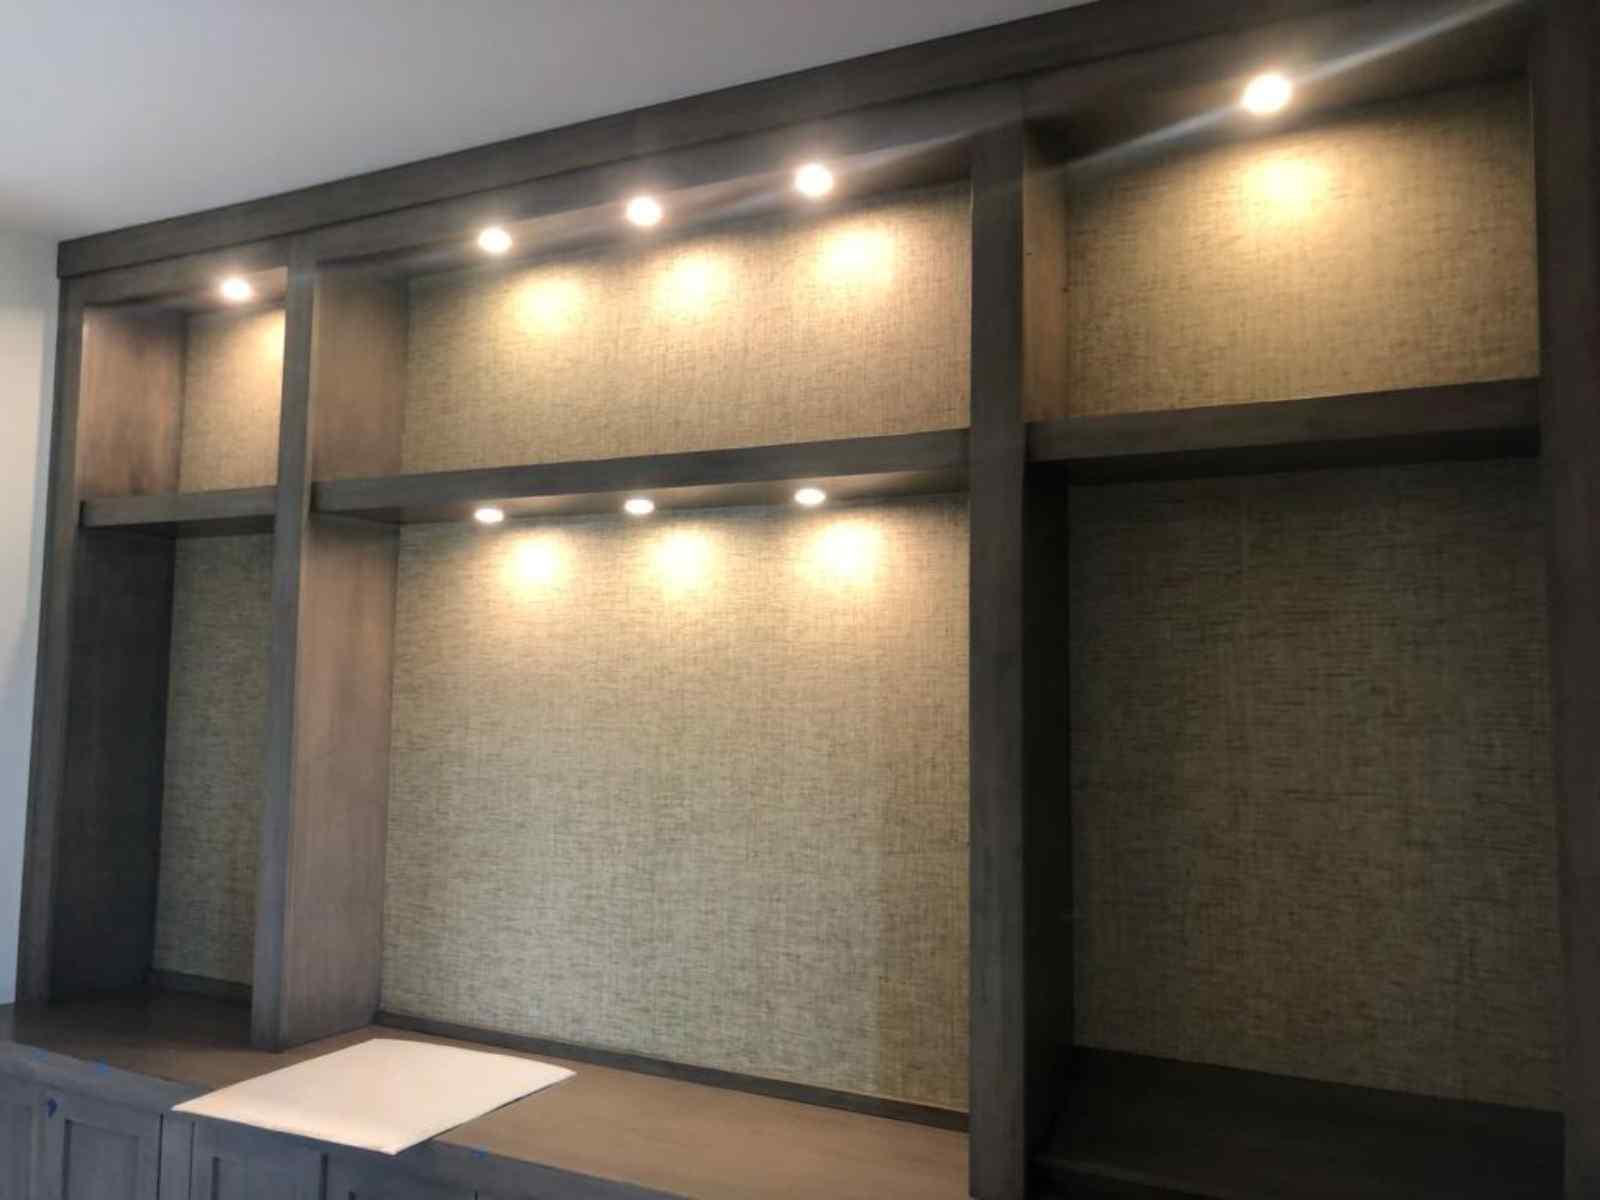 Model Home Wallcovering & Installation